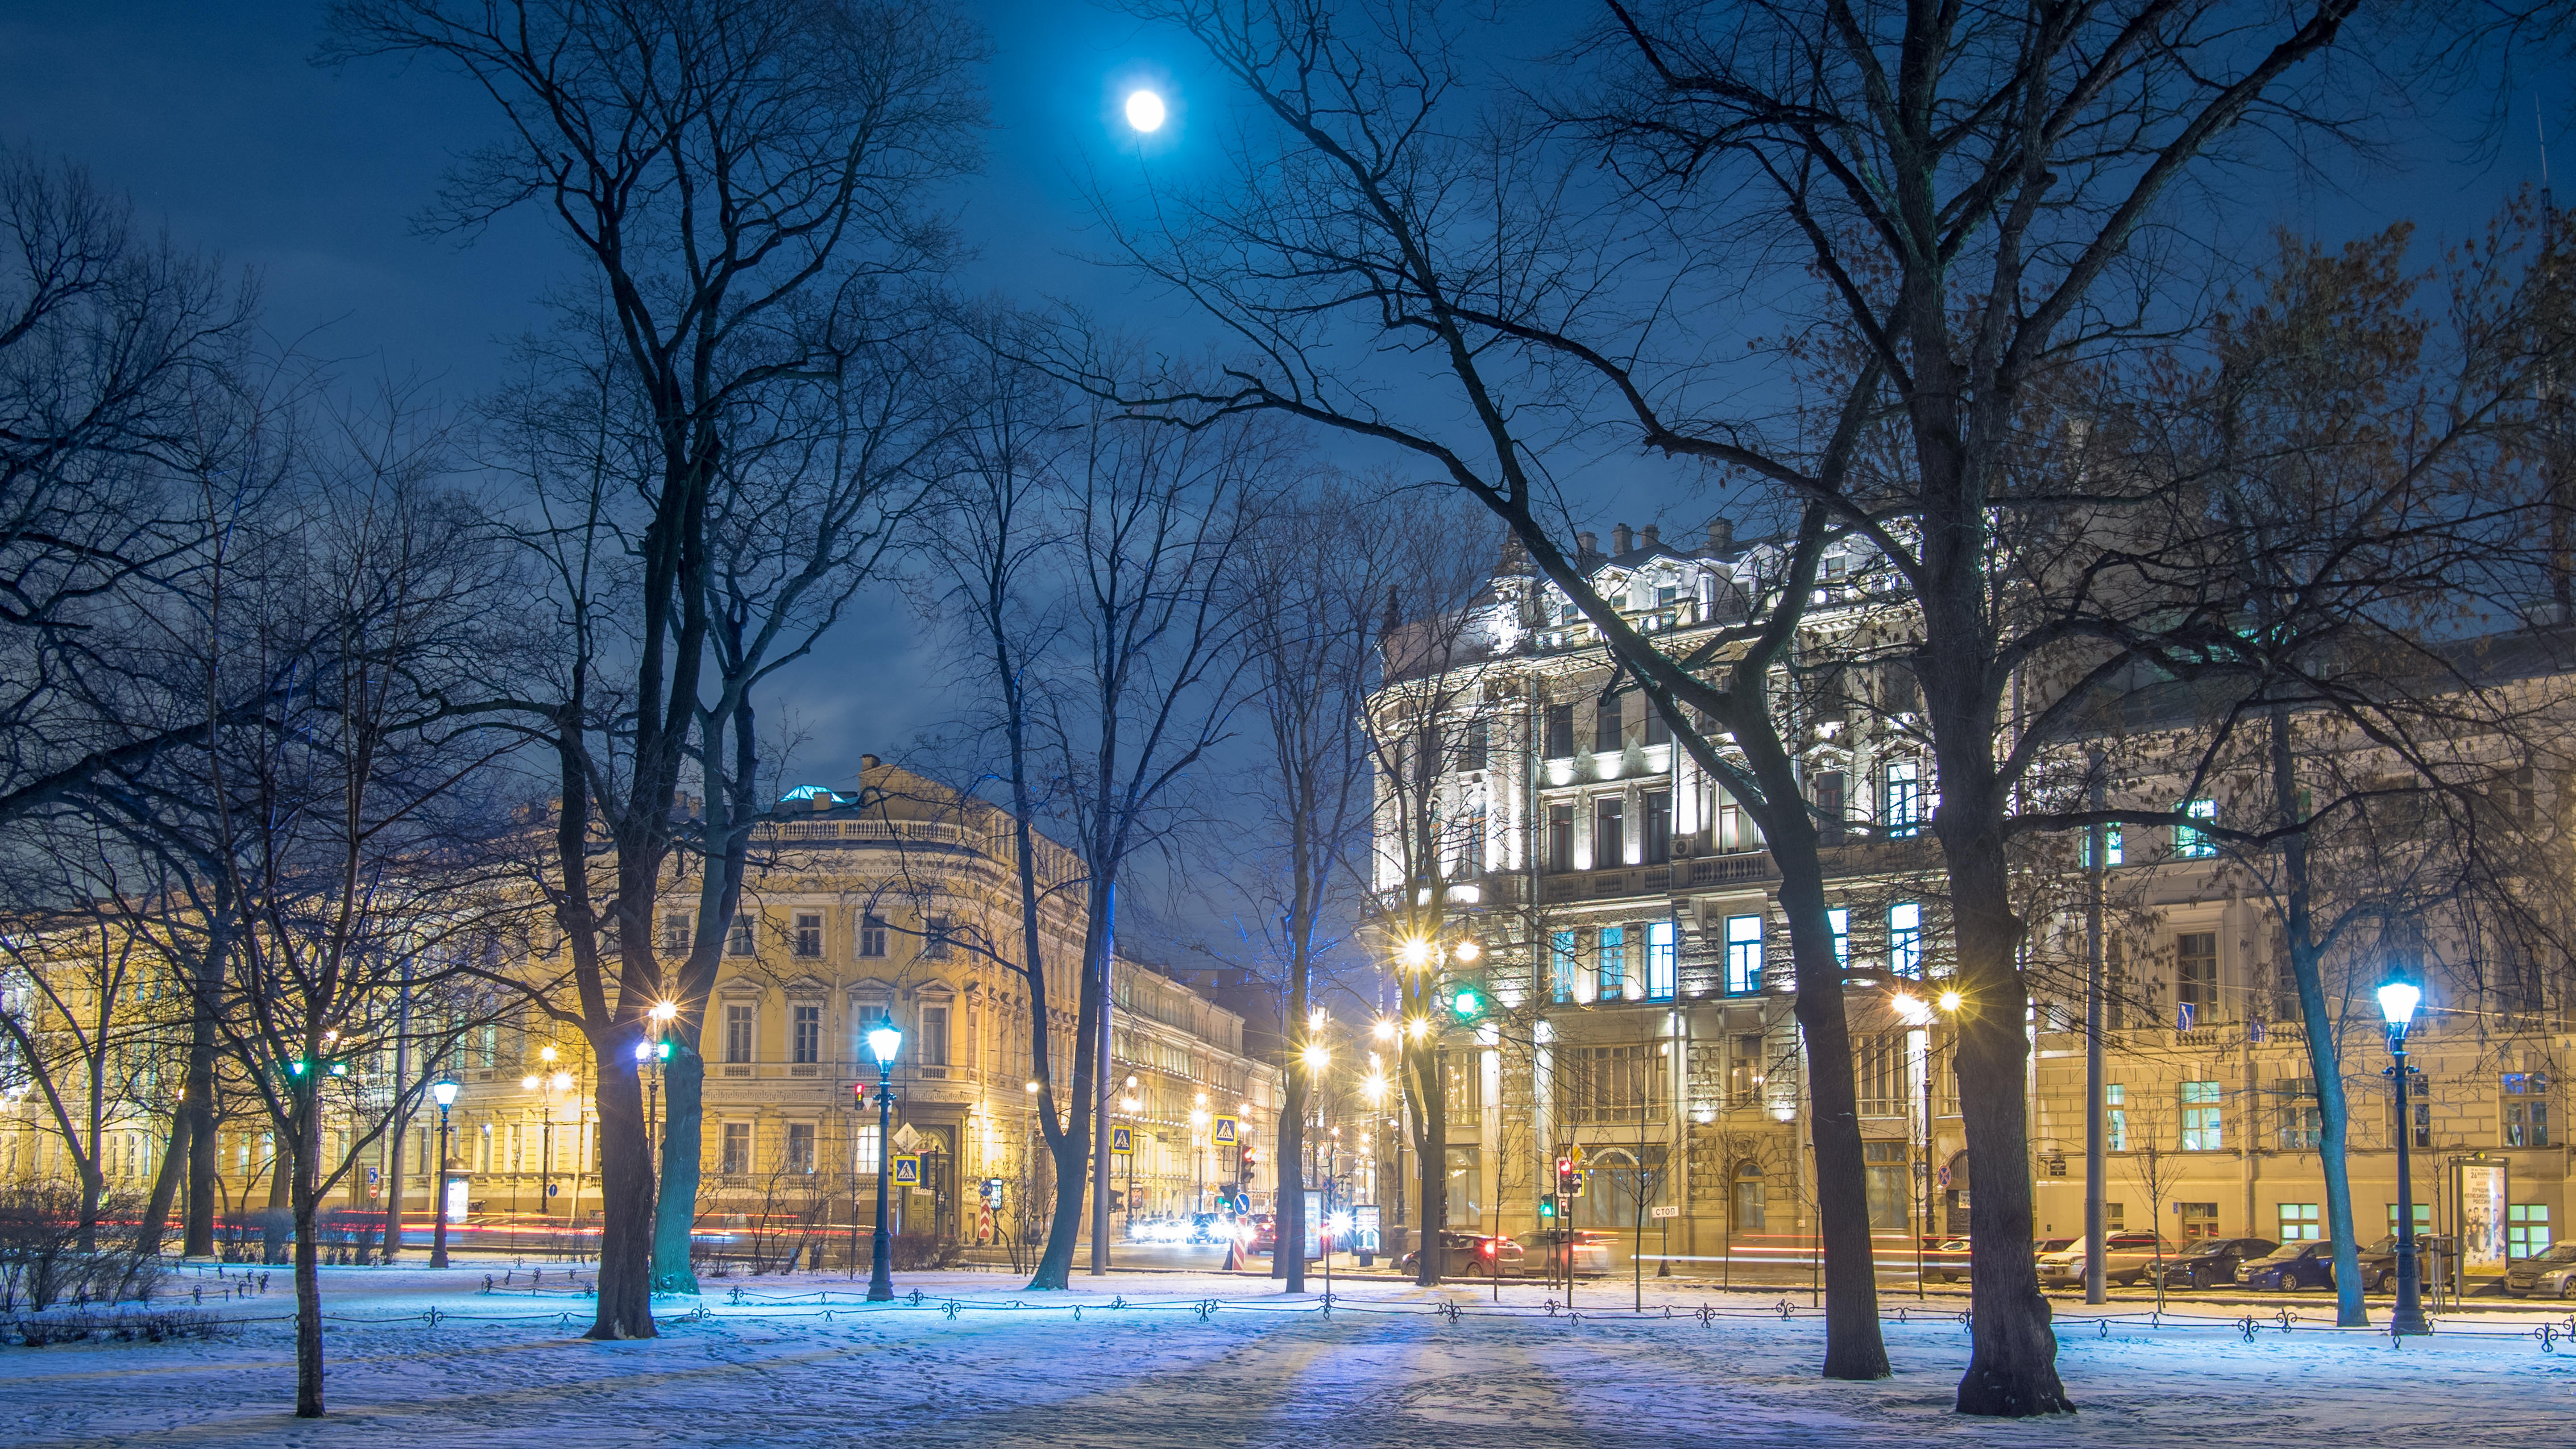 обои Невский проспект, Санкт-Петербург картинки фото